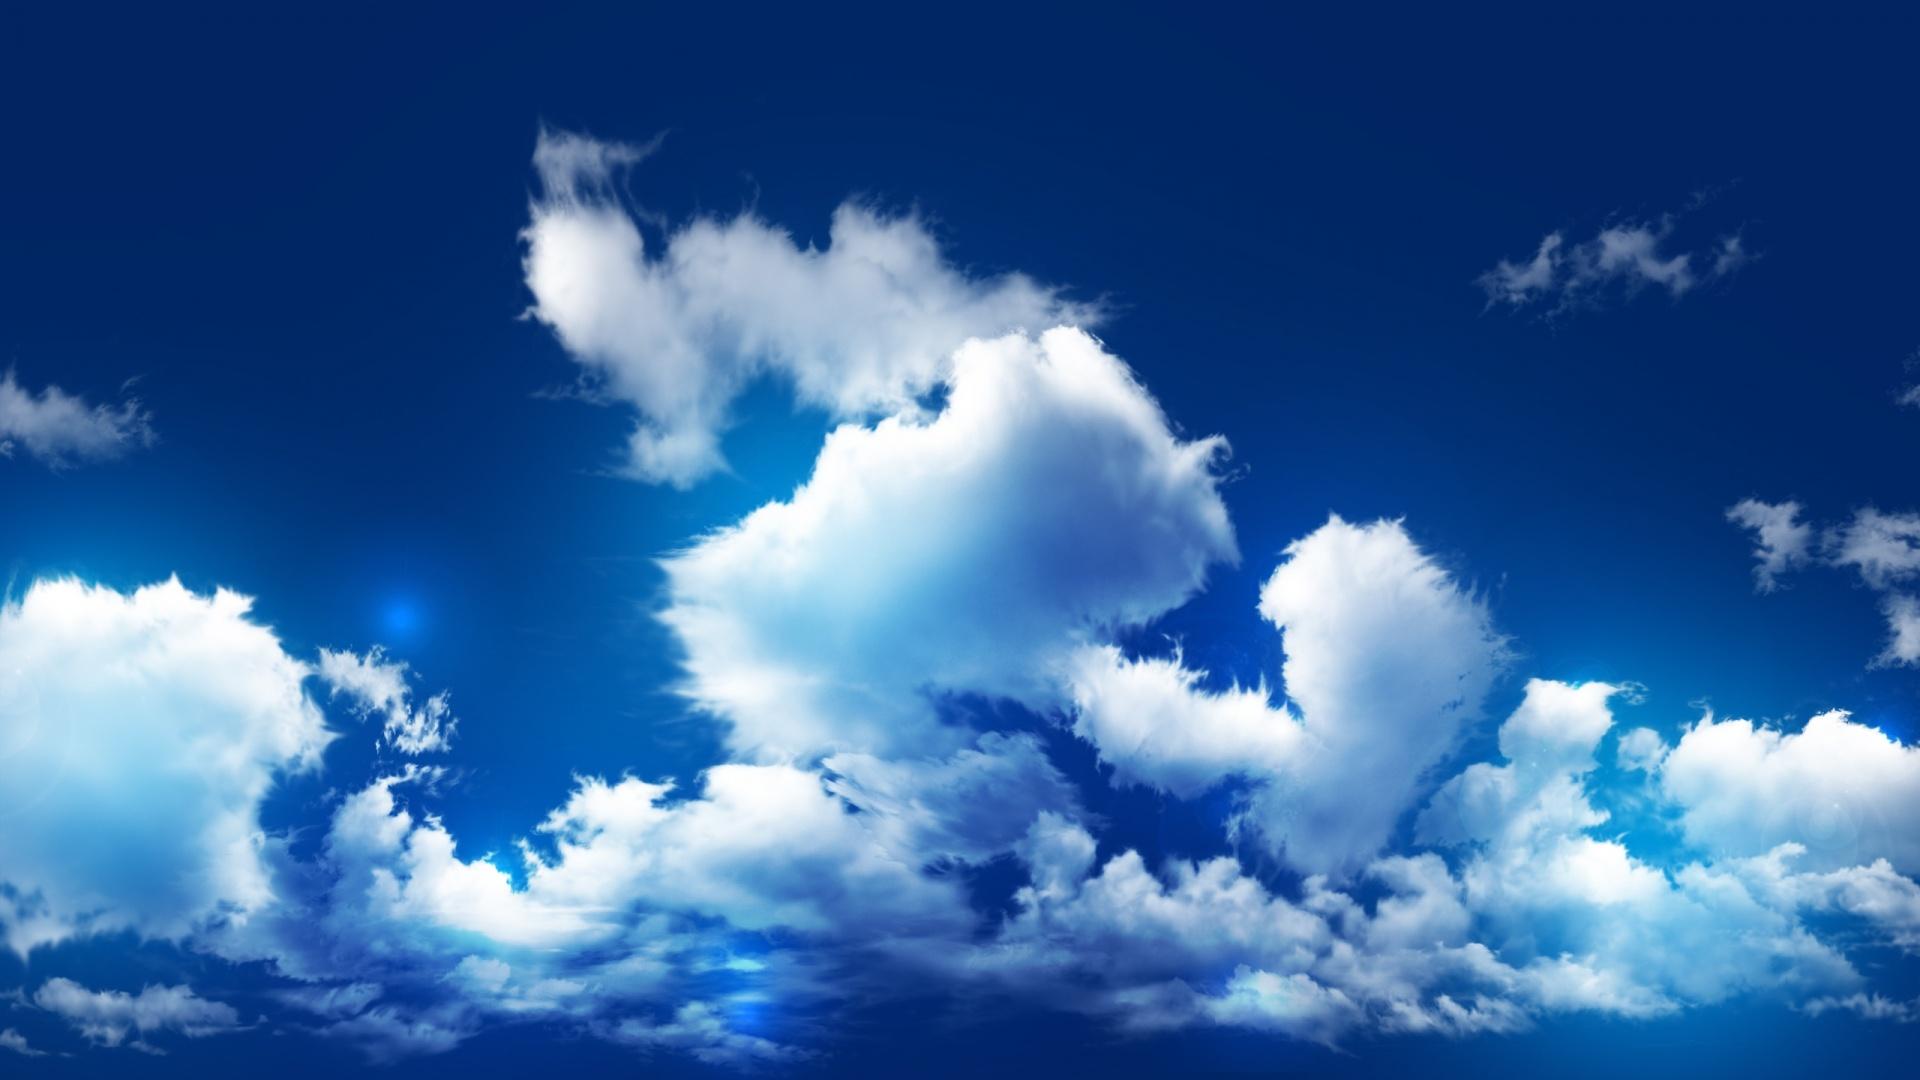 clouds wallpapers mac desktop wallpaper 1920x1080 1920x1080